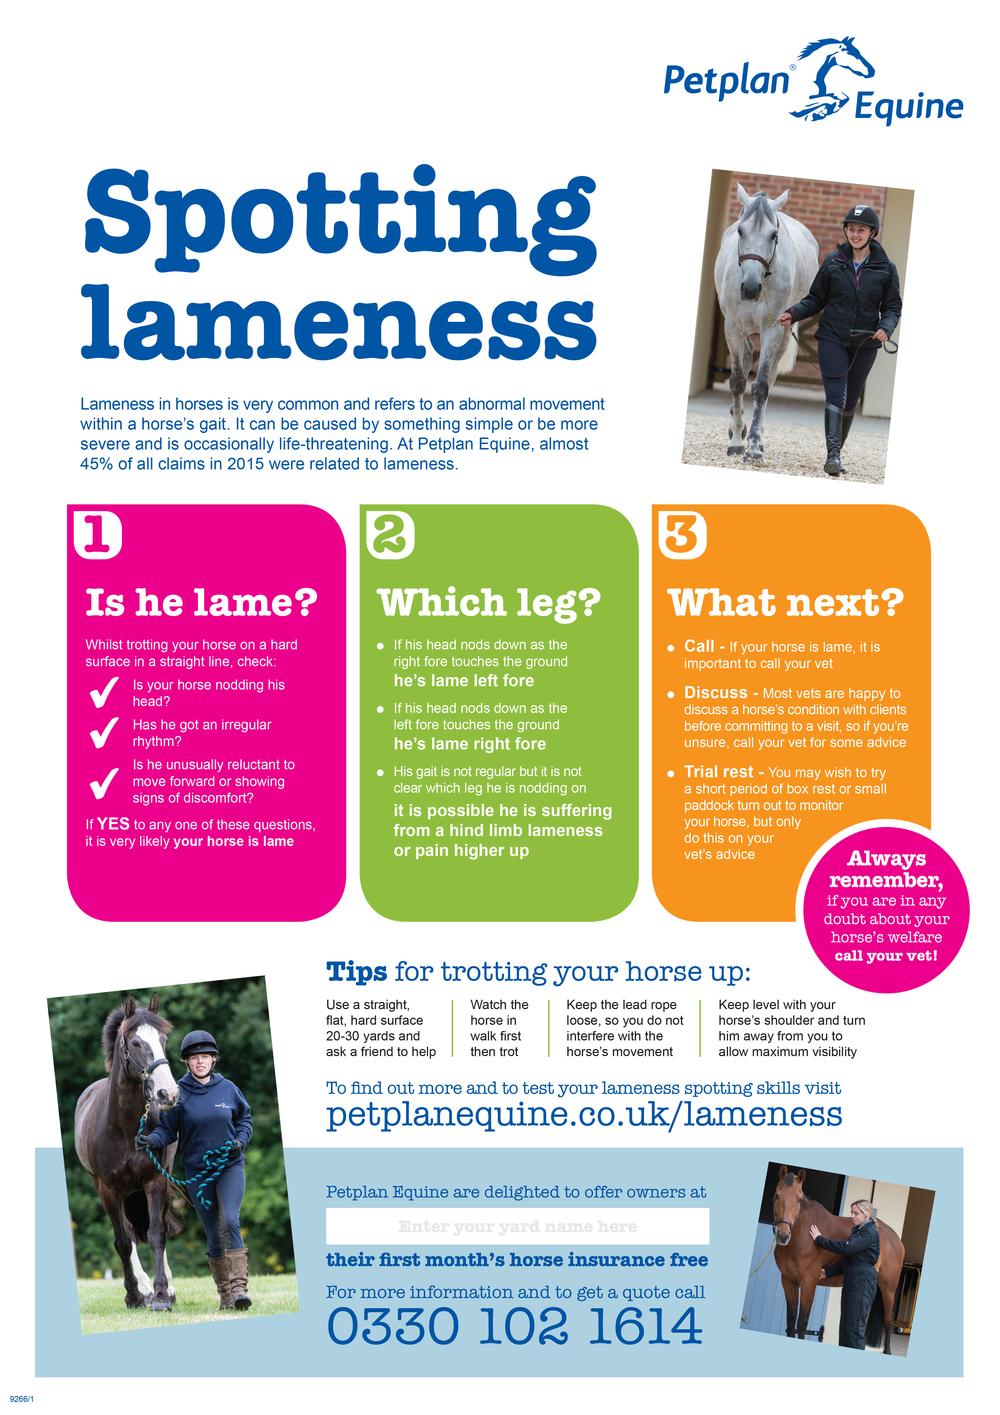 Petplan's handy poster will help you spot lameness fast